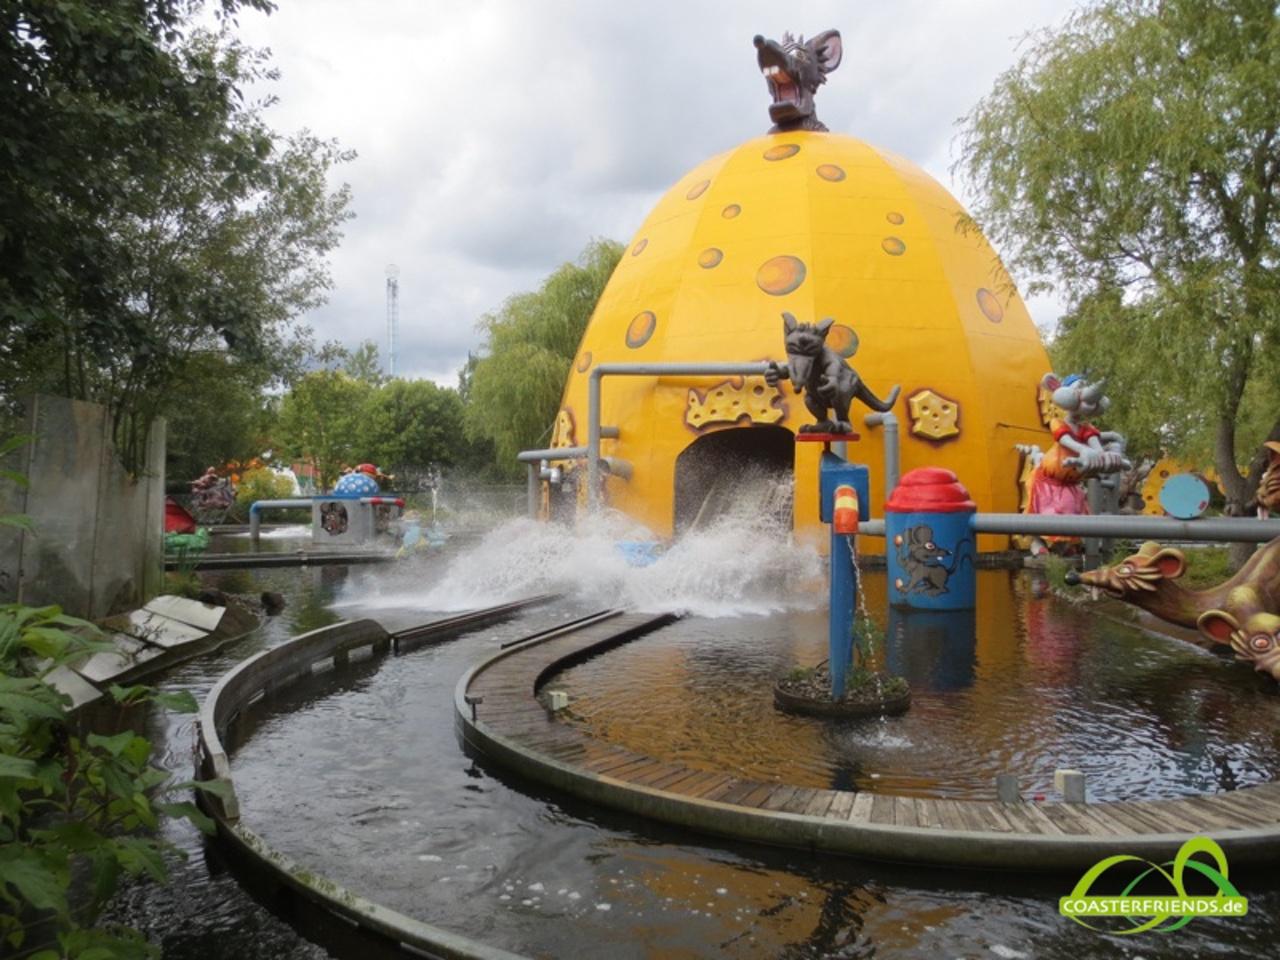 Europa - https://coasterfriends.de/joomla//images/pcp_parkdetails/europa/o268_BonBon_Land/content3.jpg